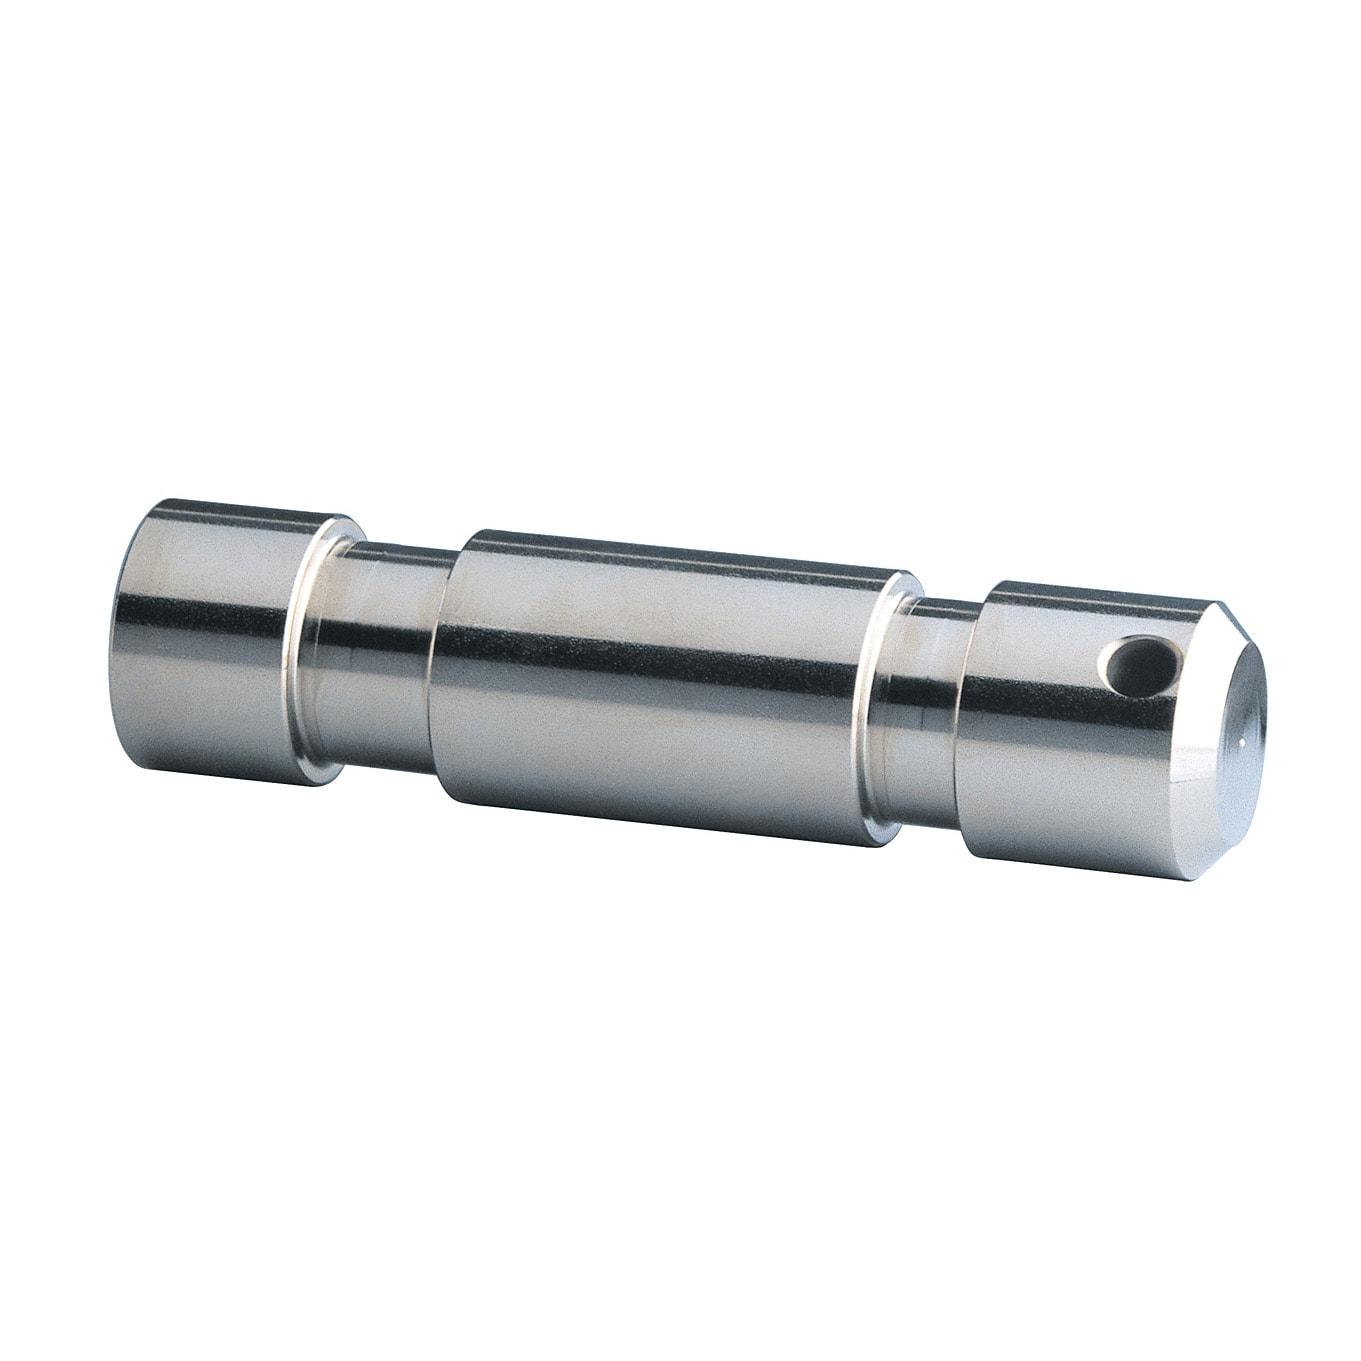 KM24519 - Tv pin